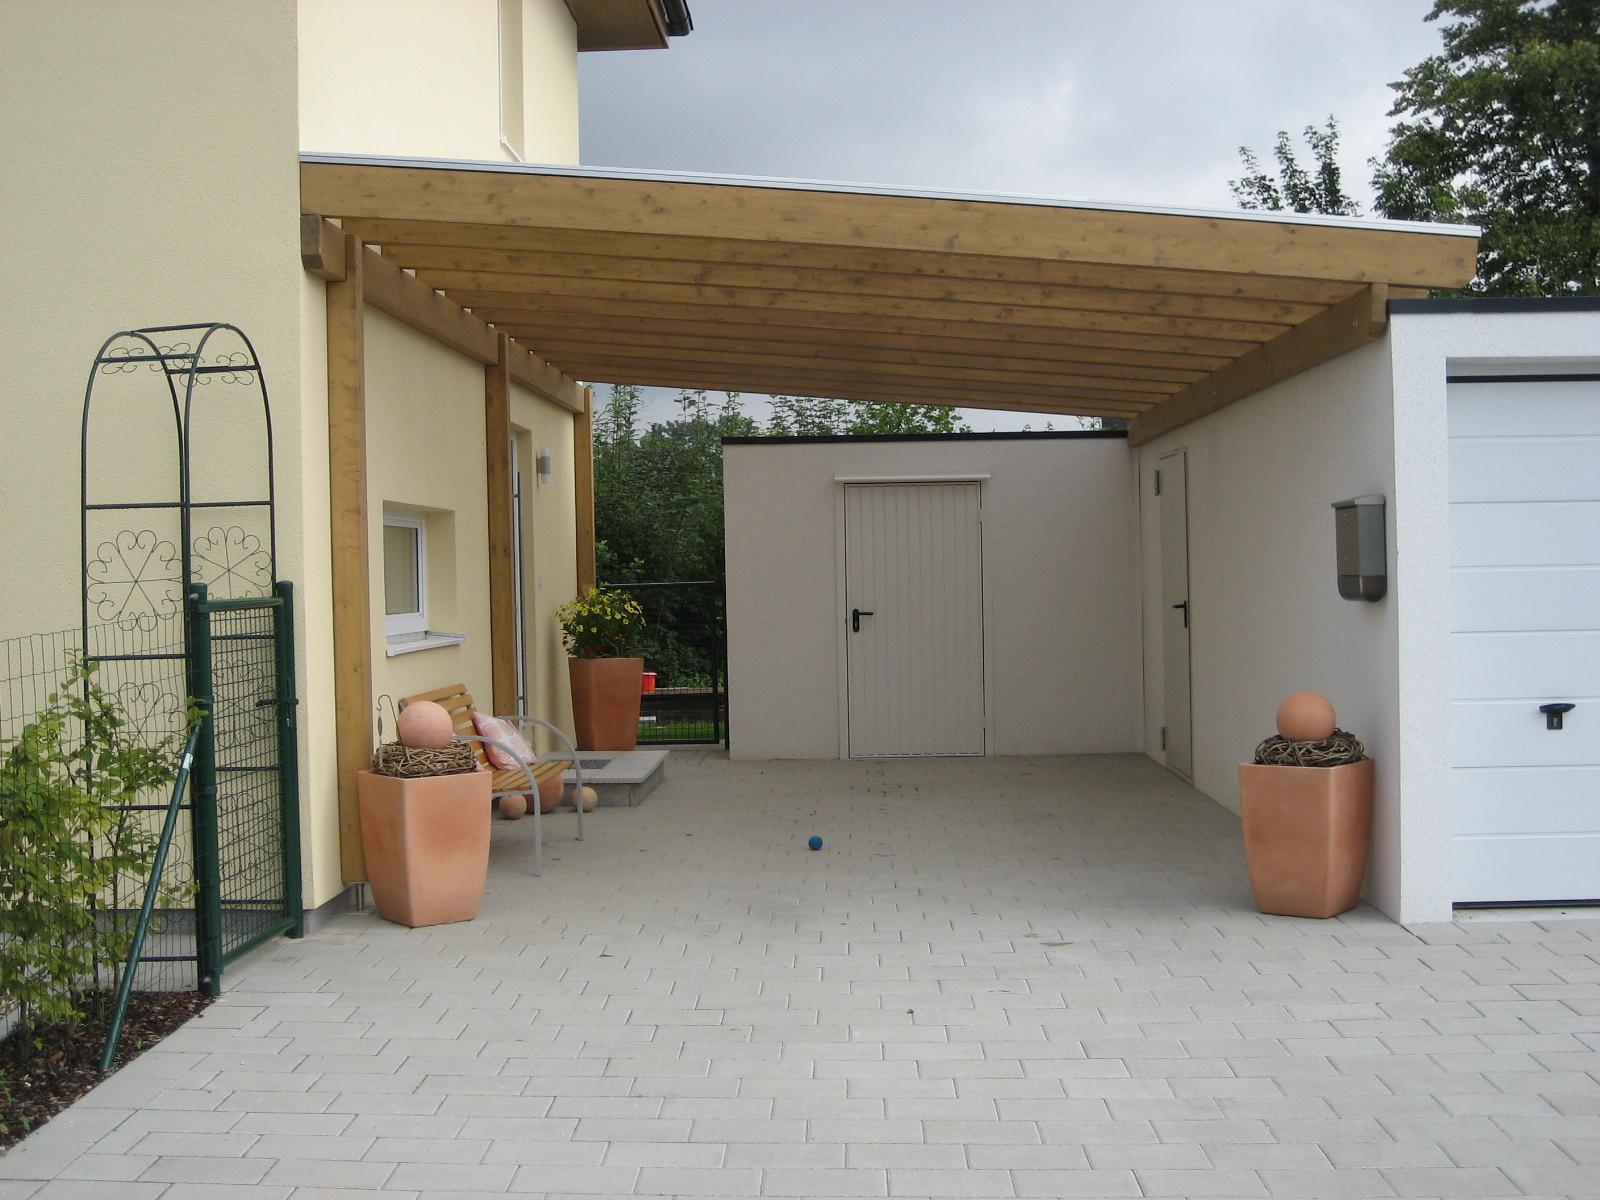 Carport mit Thermoclear Stegplatten